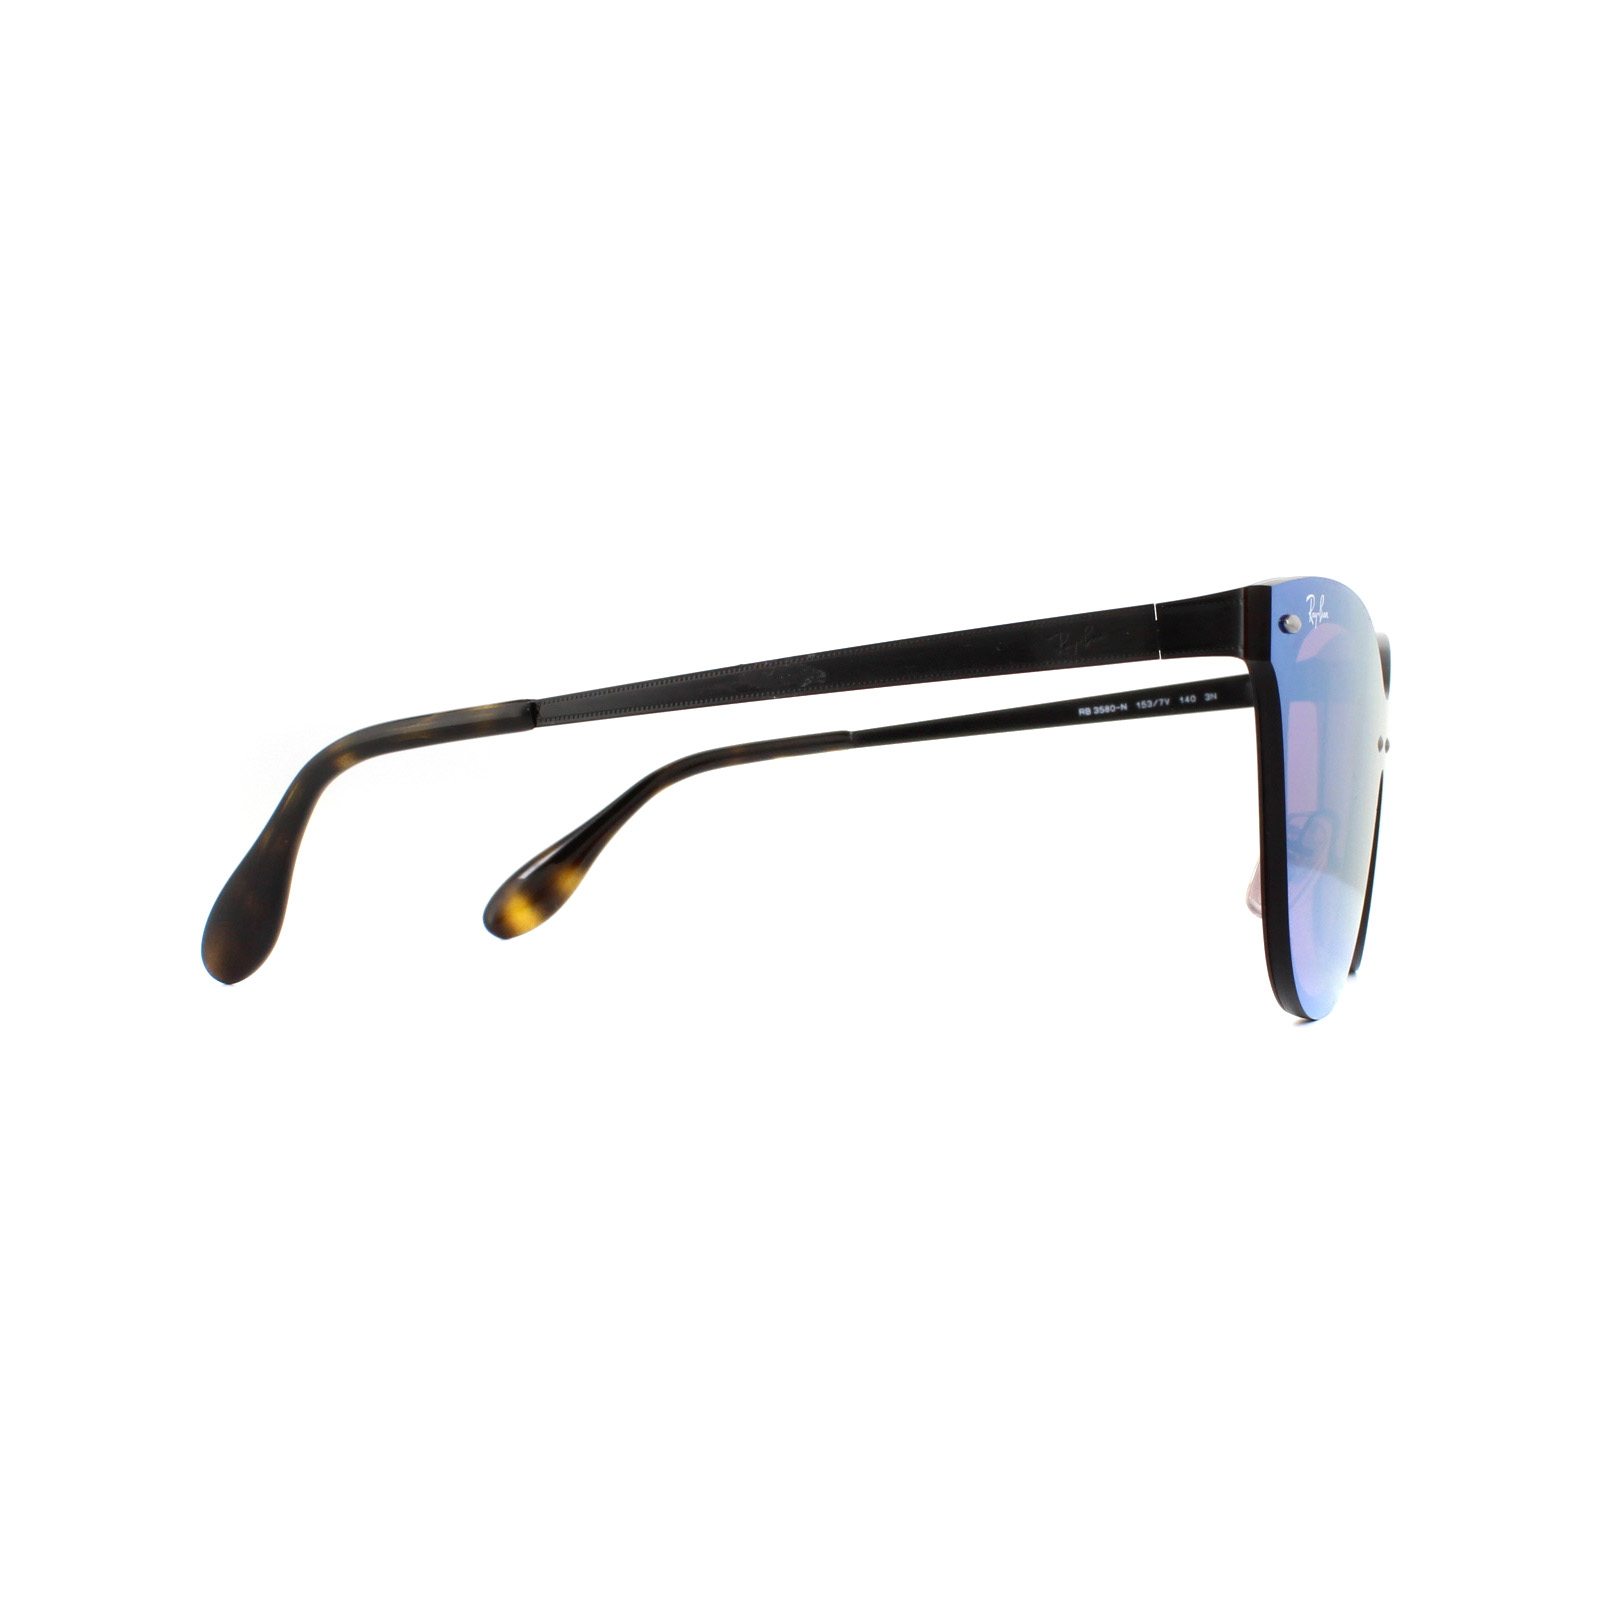 f3d2728fc9b5 Sentinel Ray-Ban Sunglasses Blaze Cat Eye 3580N 153 7V Black Dark Violet  Mirror Blue